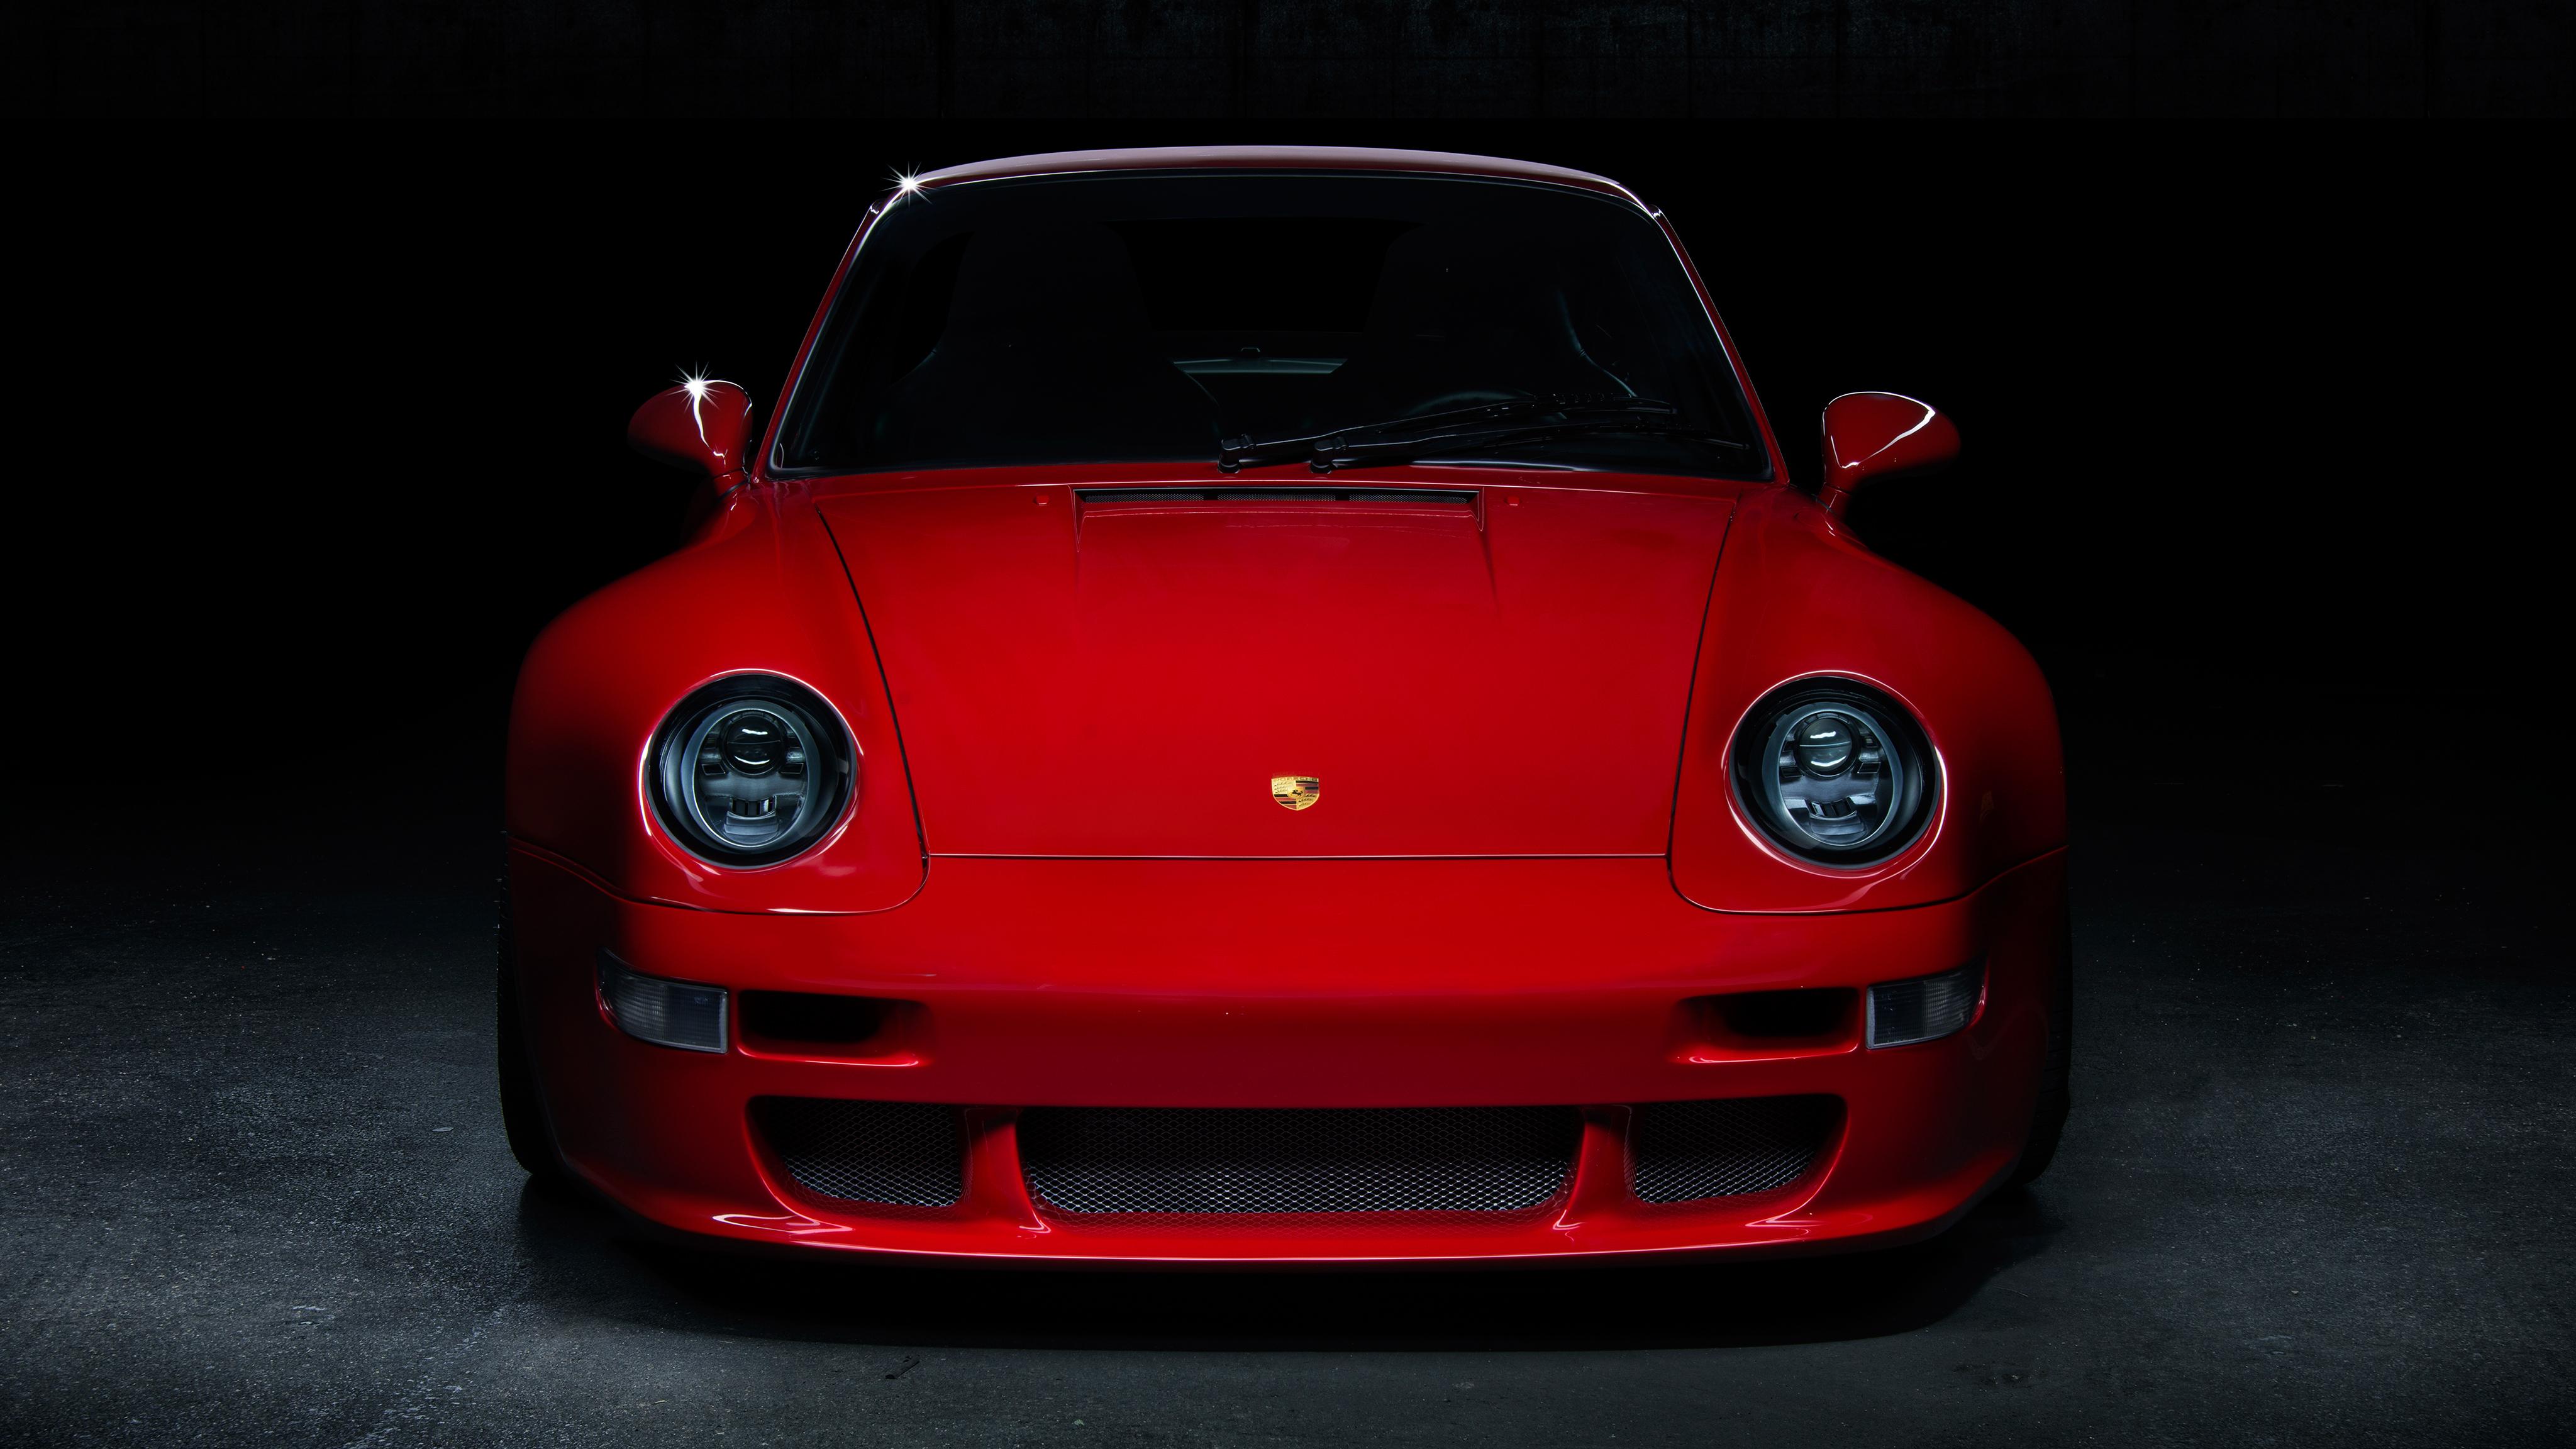 Cars Hd Wallpapers 1080p For Pc Bmw Gunther Werks 400r Porsche 993 4k 3 Wallpaper Hd Car